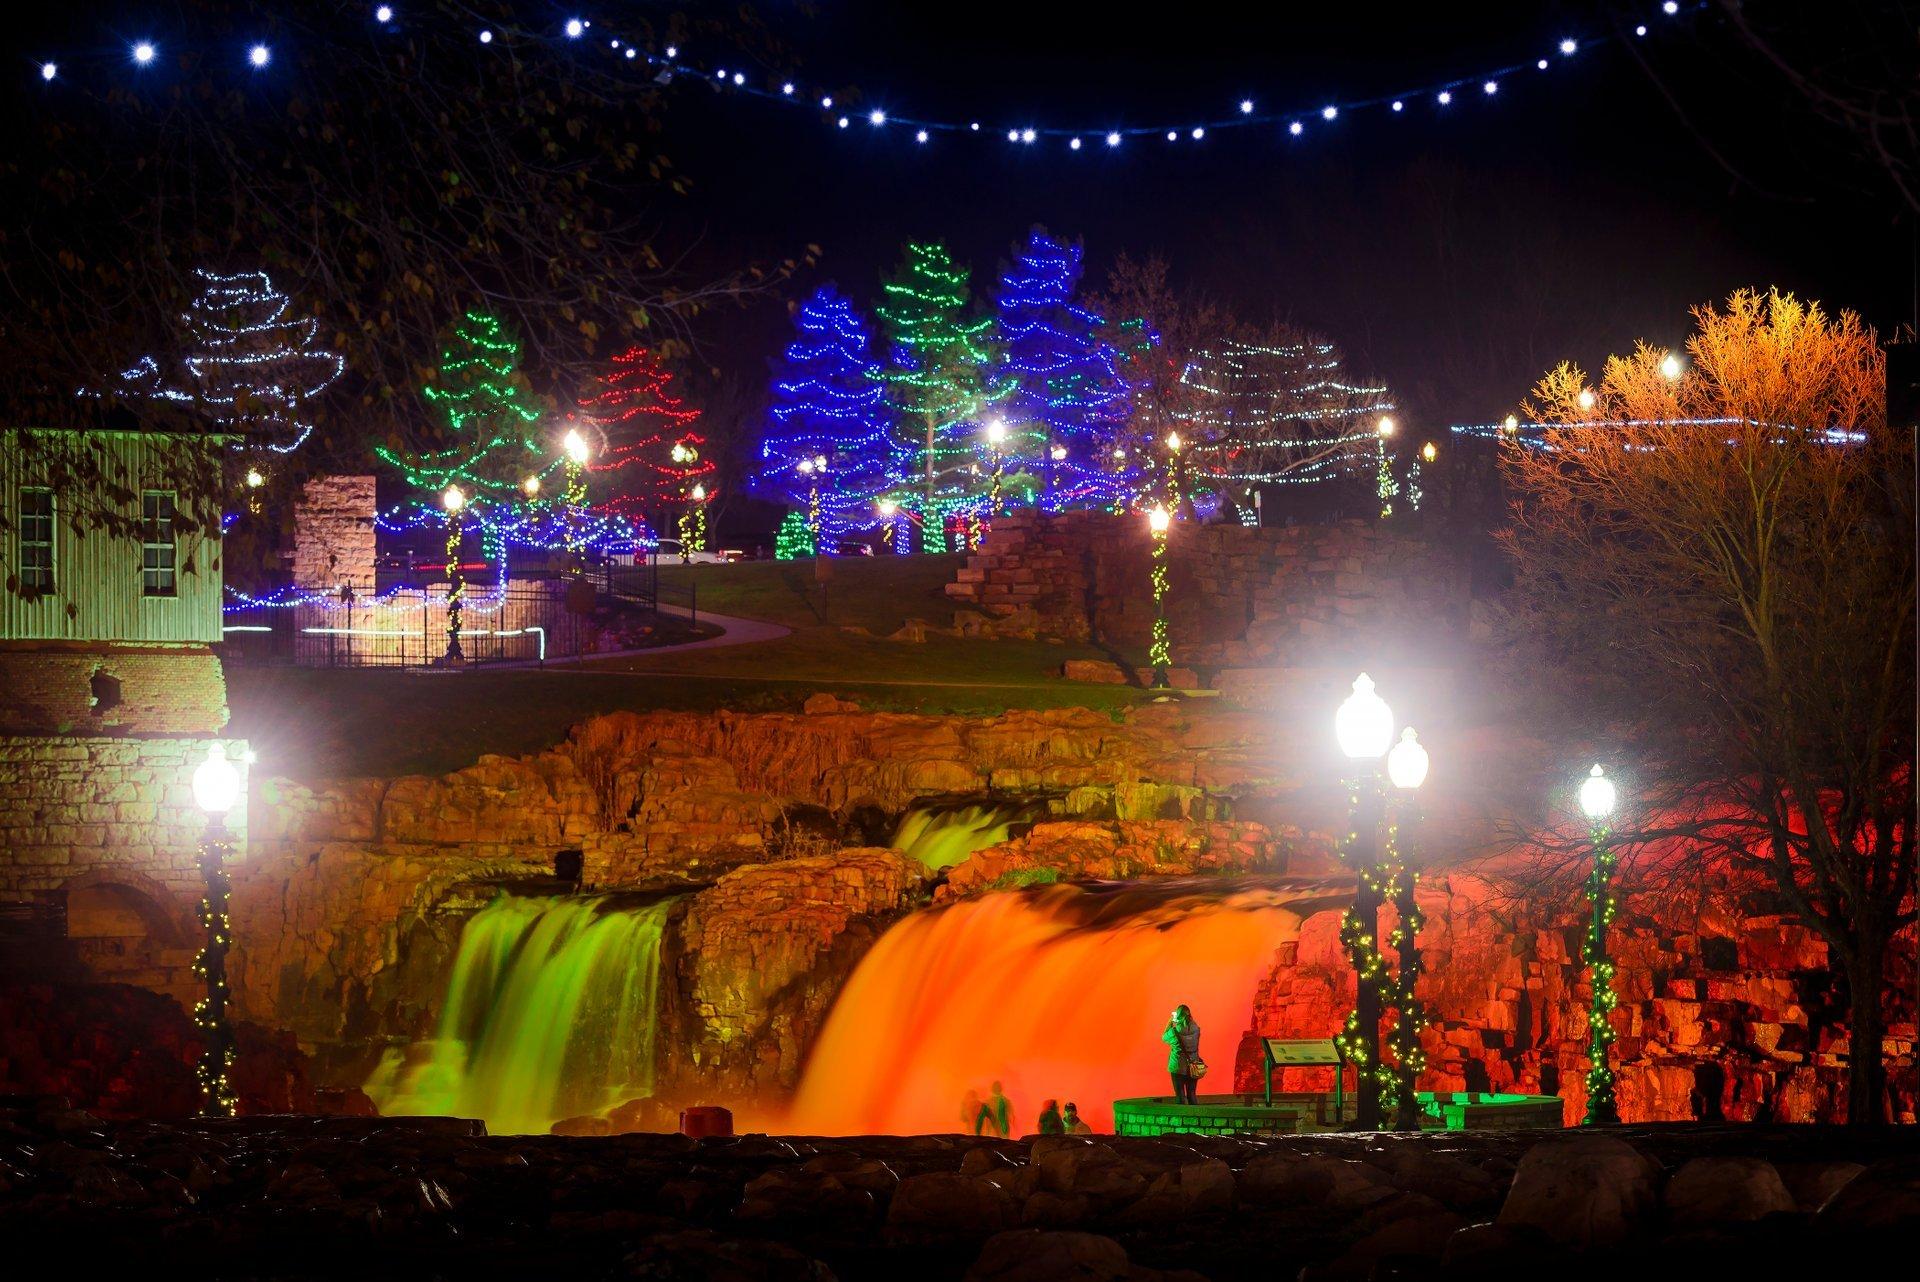 Winter Wonderland at Falls Park in South Dakota - Best Season 2020